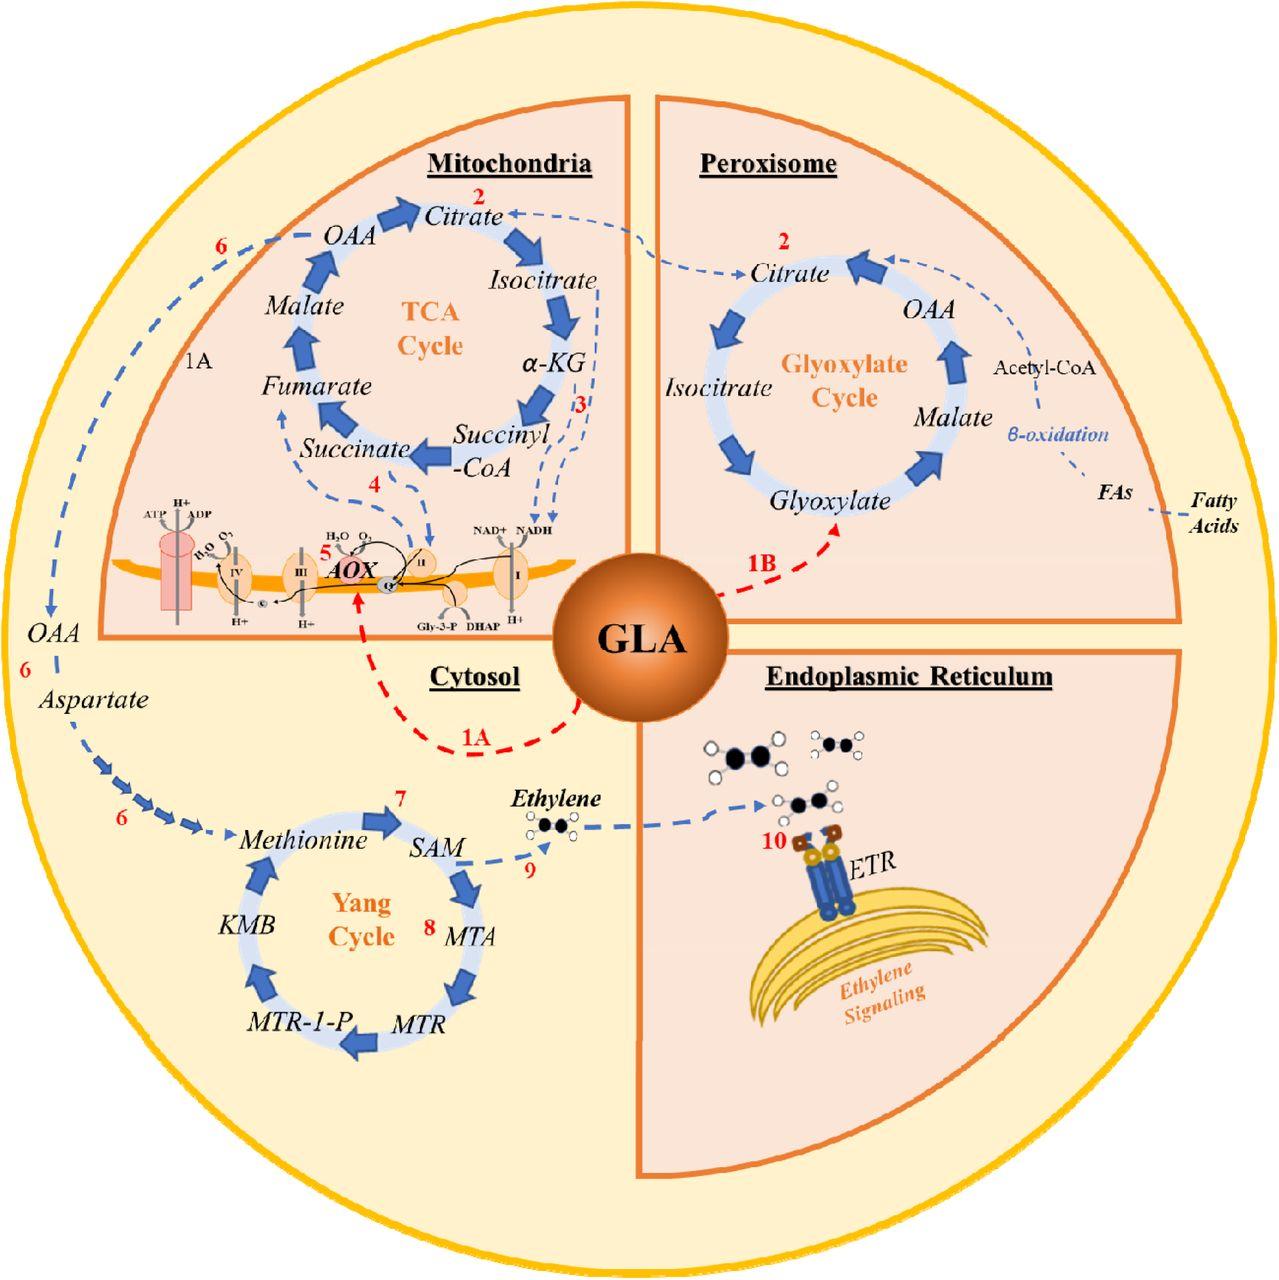 Glyoxylic acid overcomes 1-MCP-induced blockage of fruit